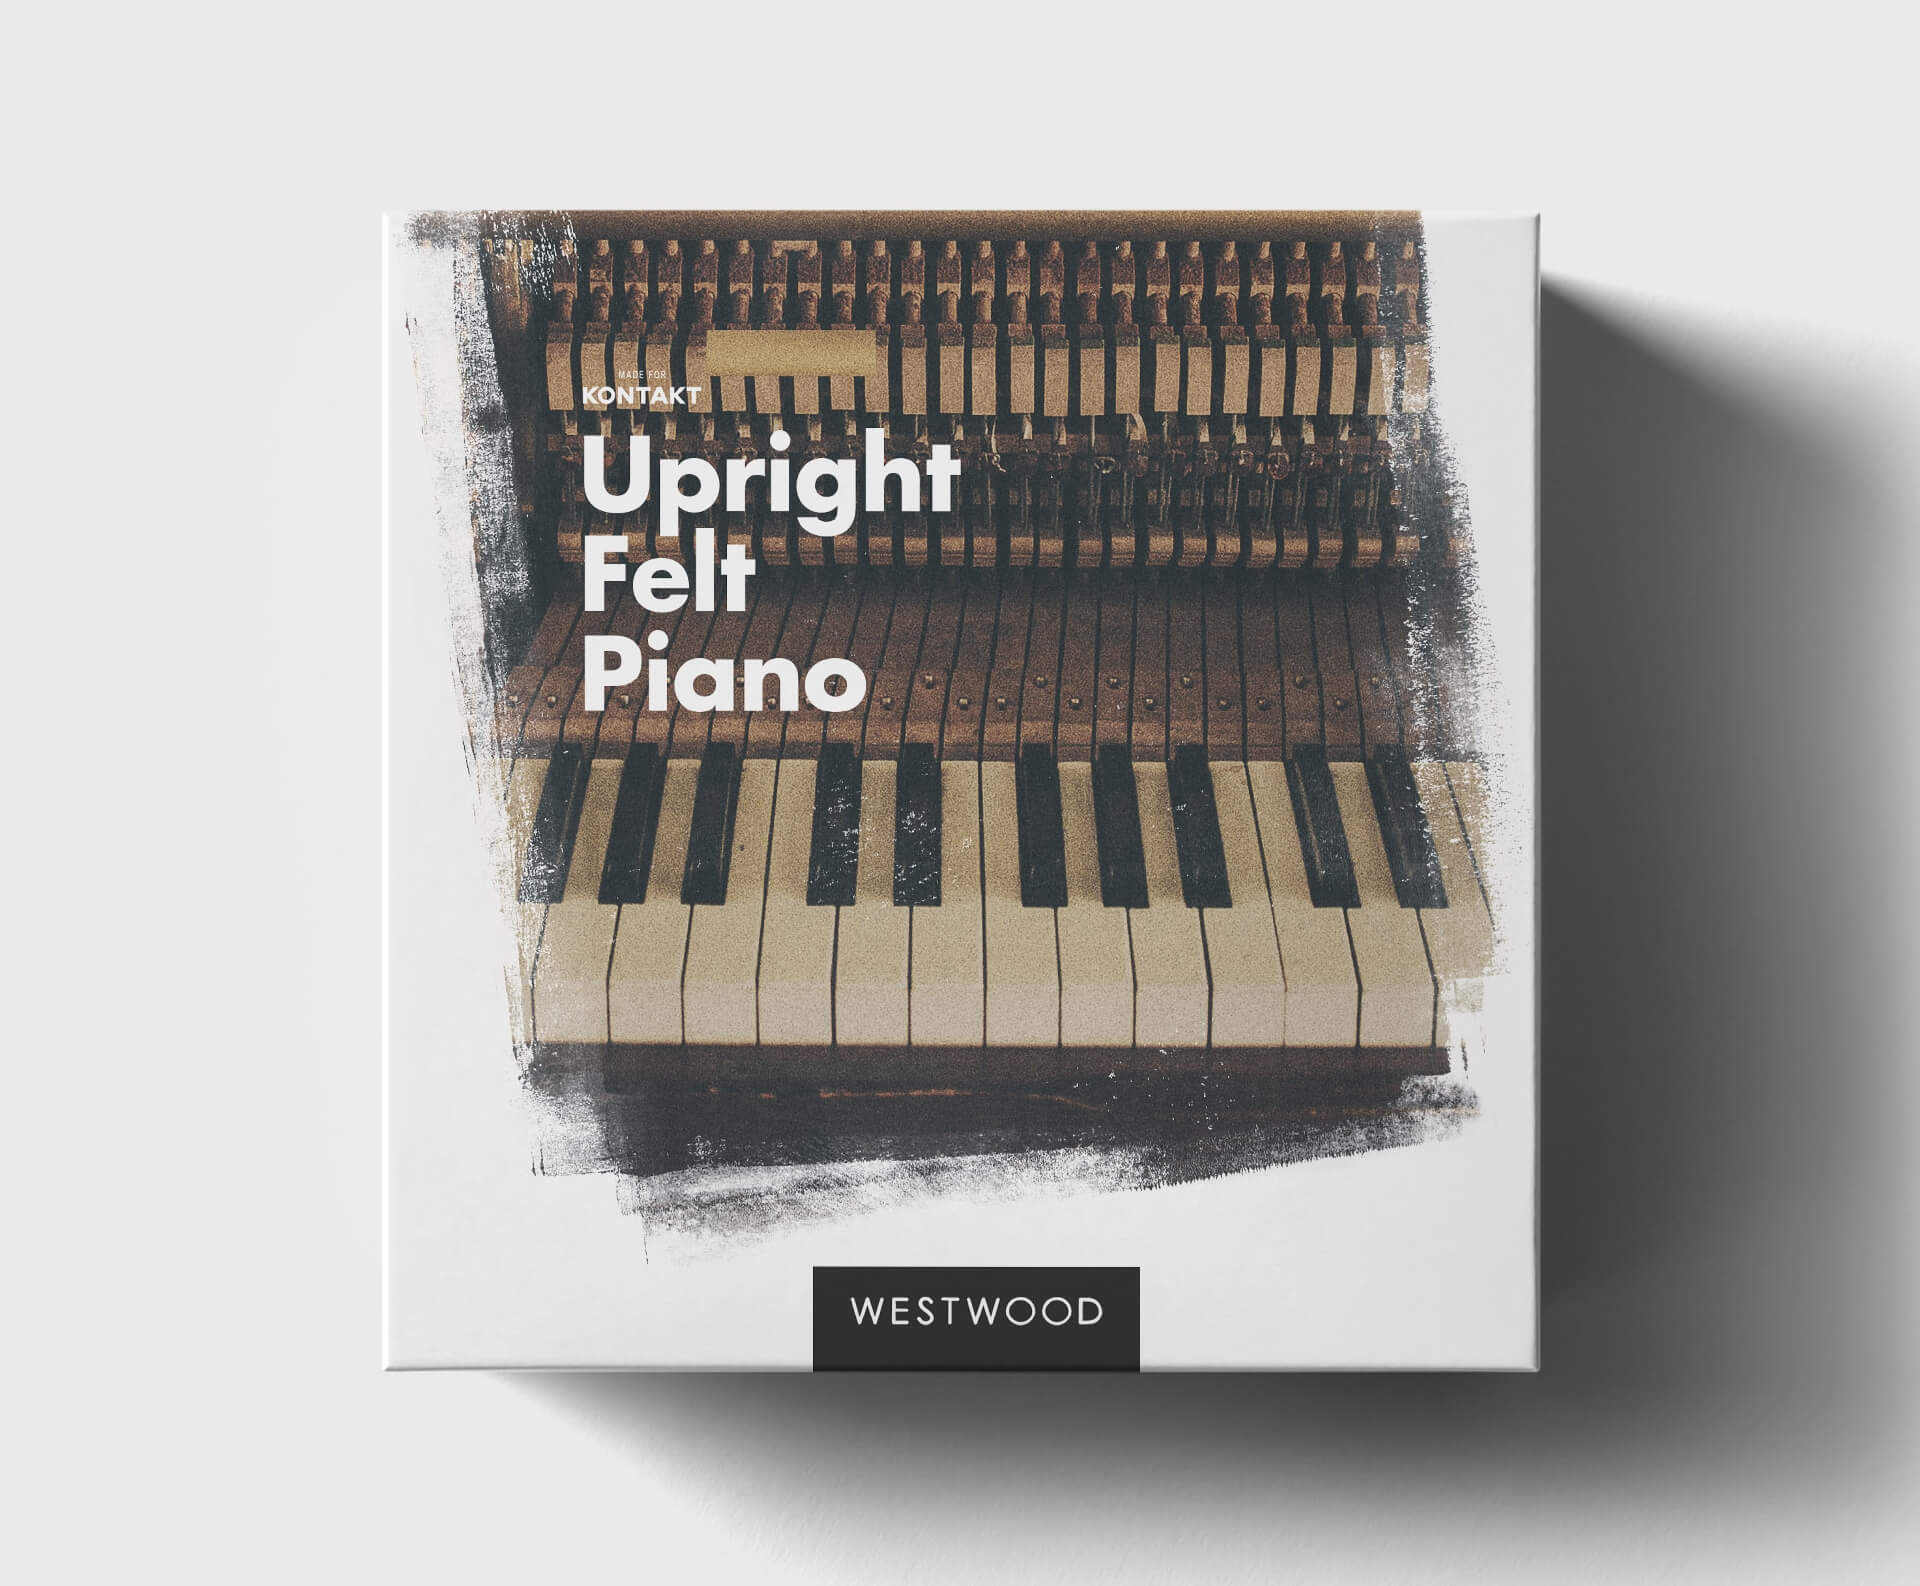 Westwood Upright Felt Piano, free Kontakt instrument with